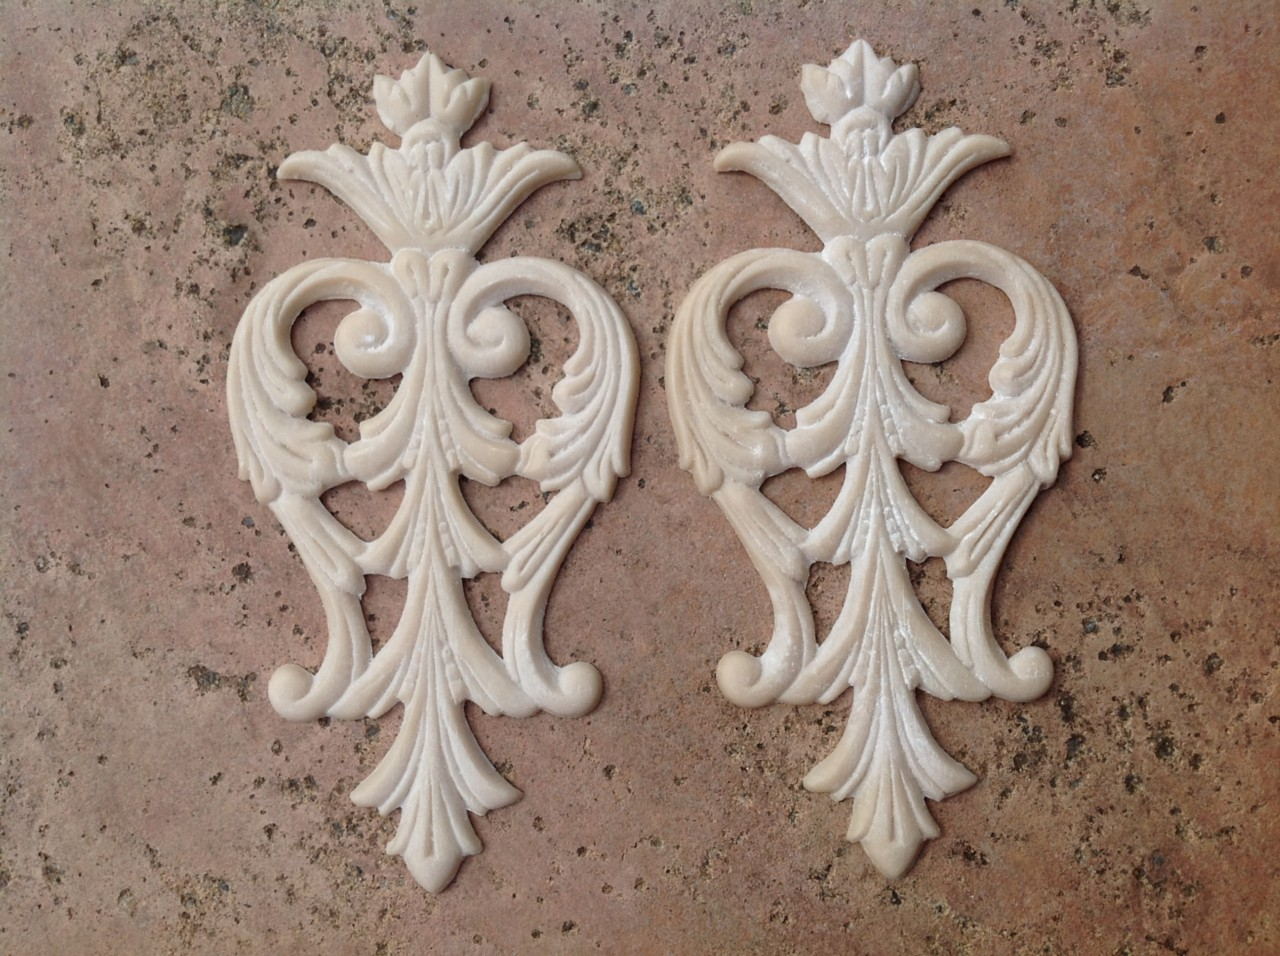 Furniture crest applique mold decoration shabby french for Applique furniture decoration